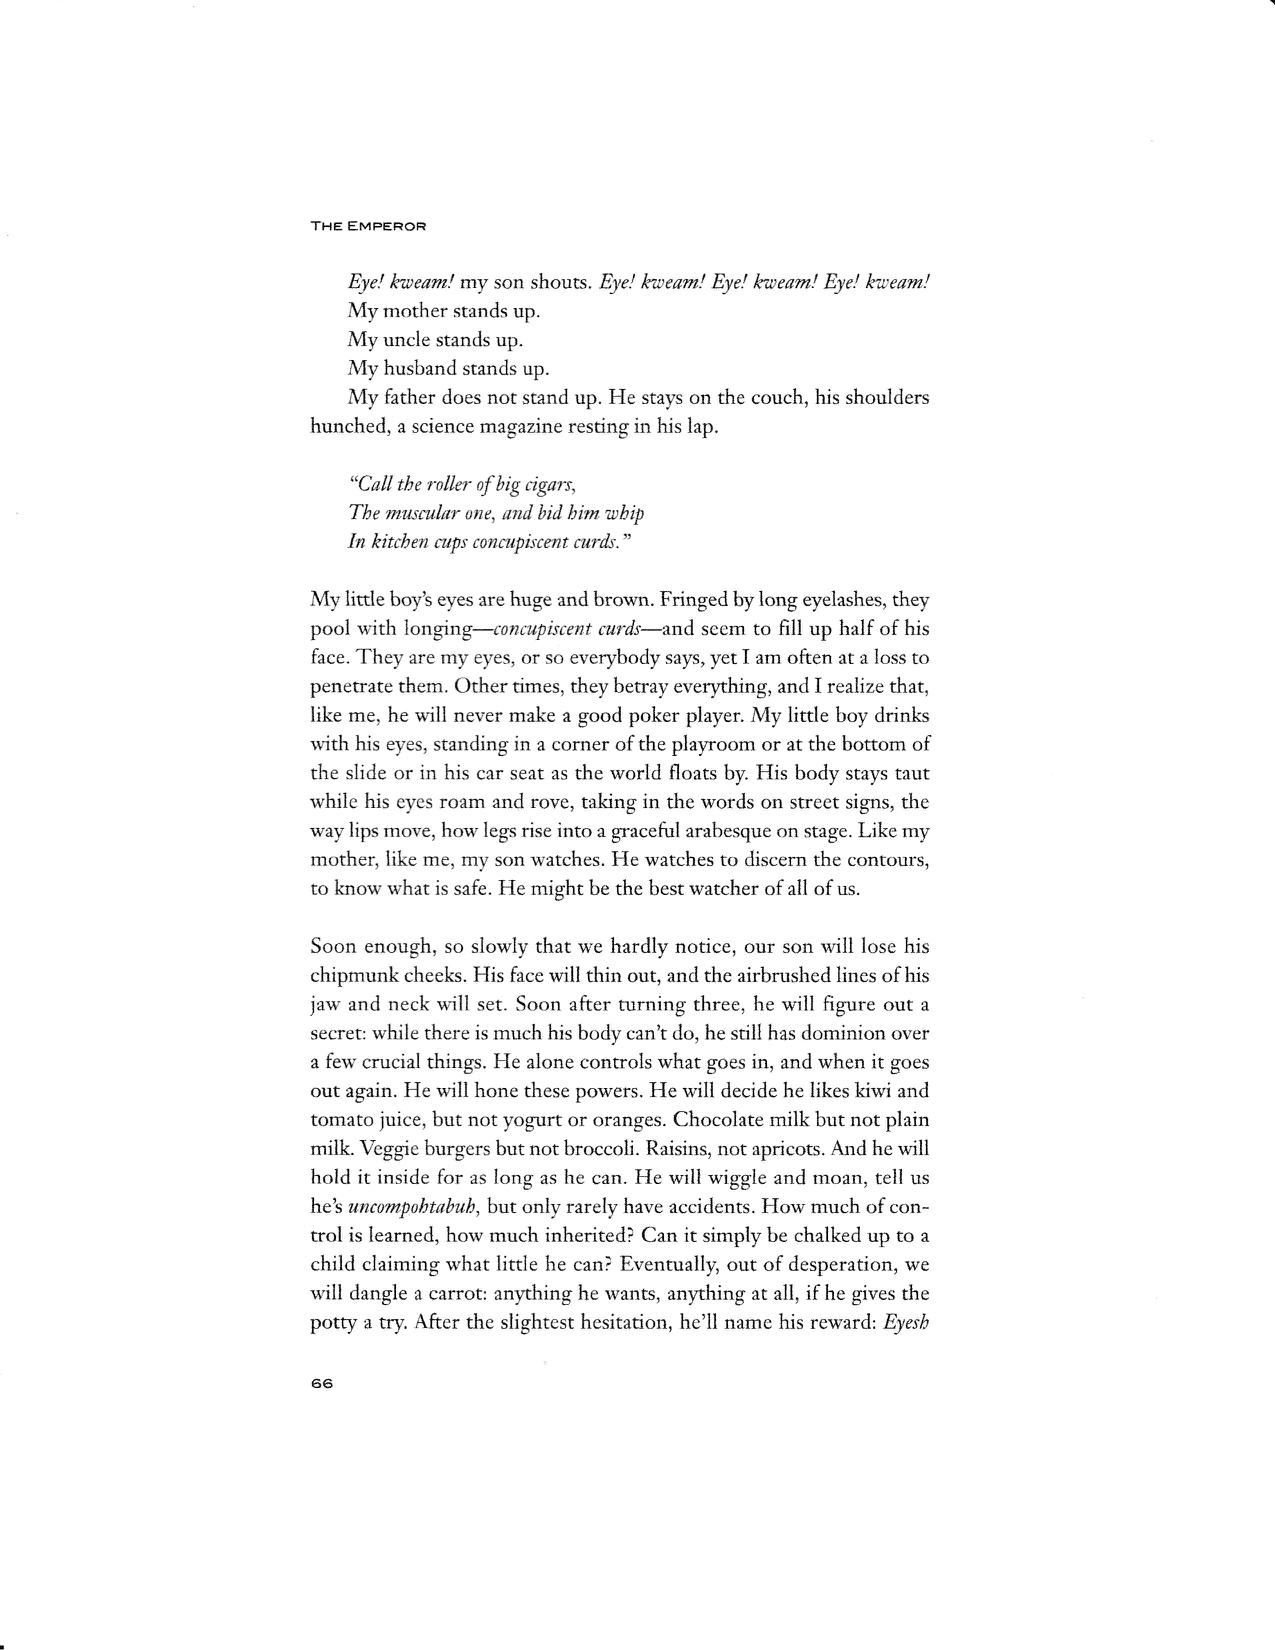 Tahoma_Literary_Review_The_Emperor 10.jpg